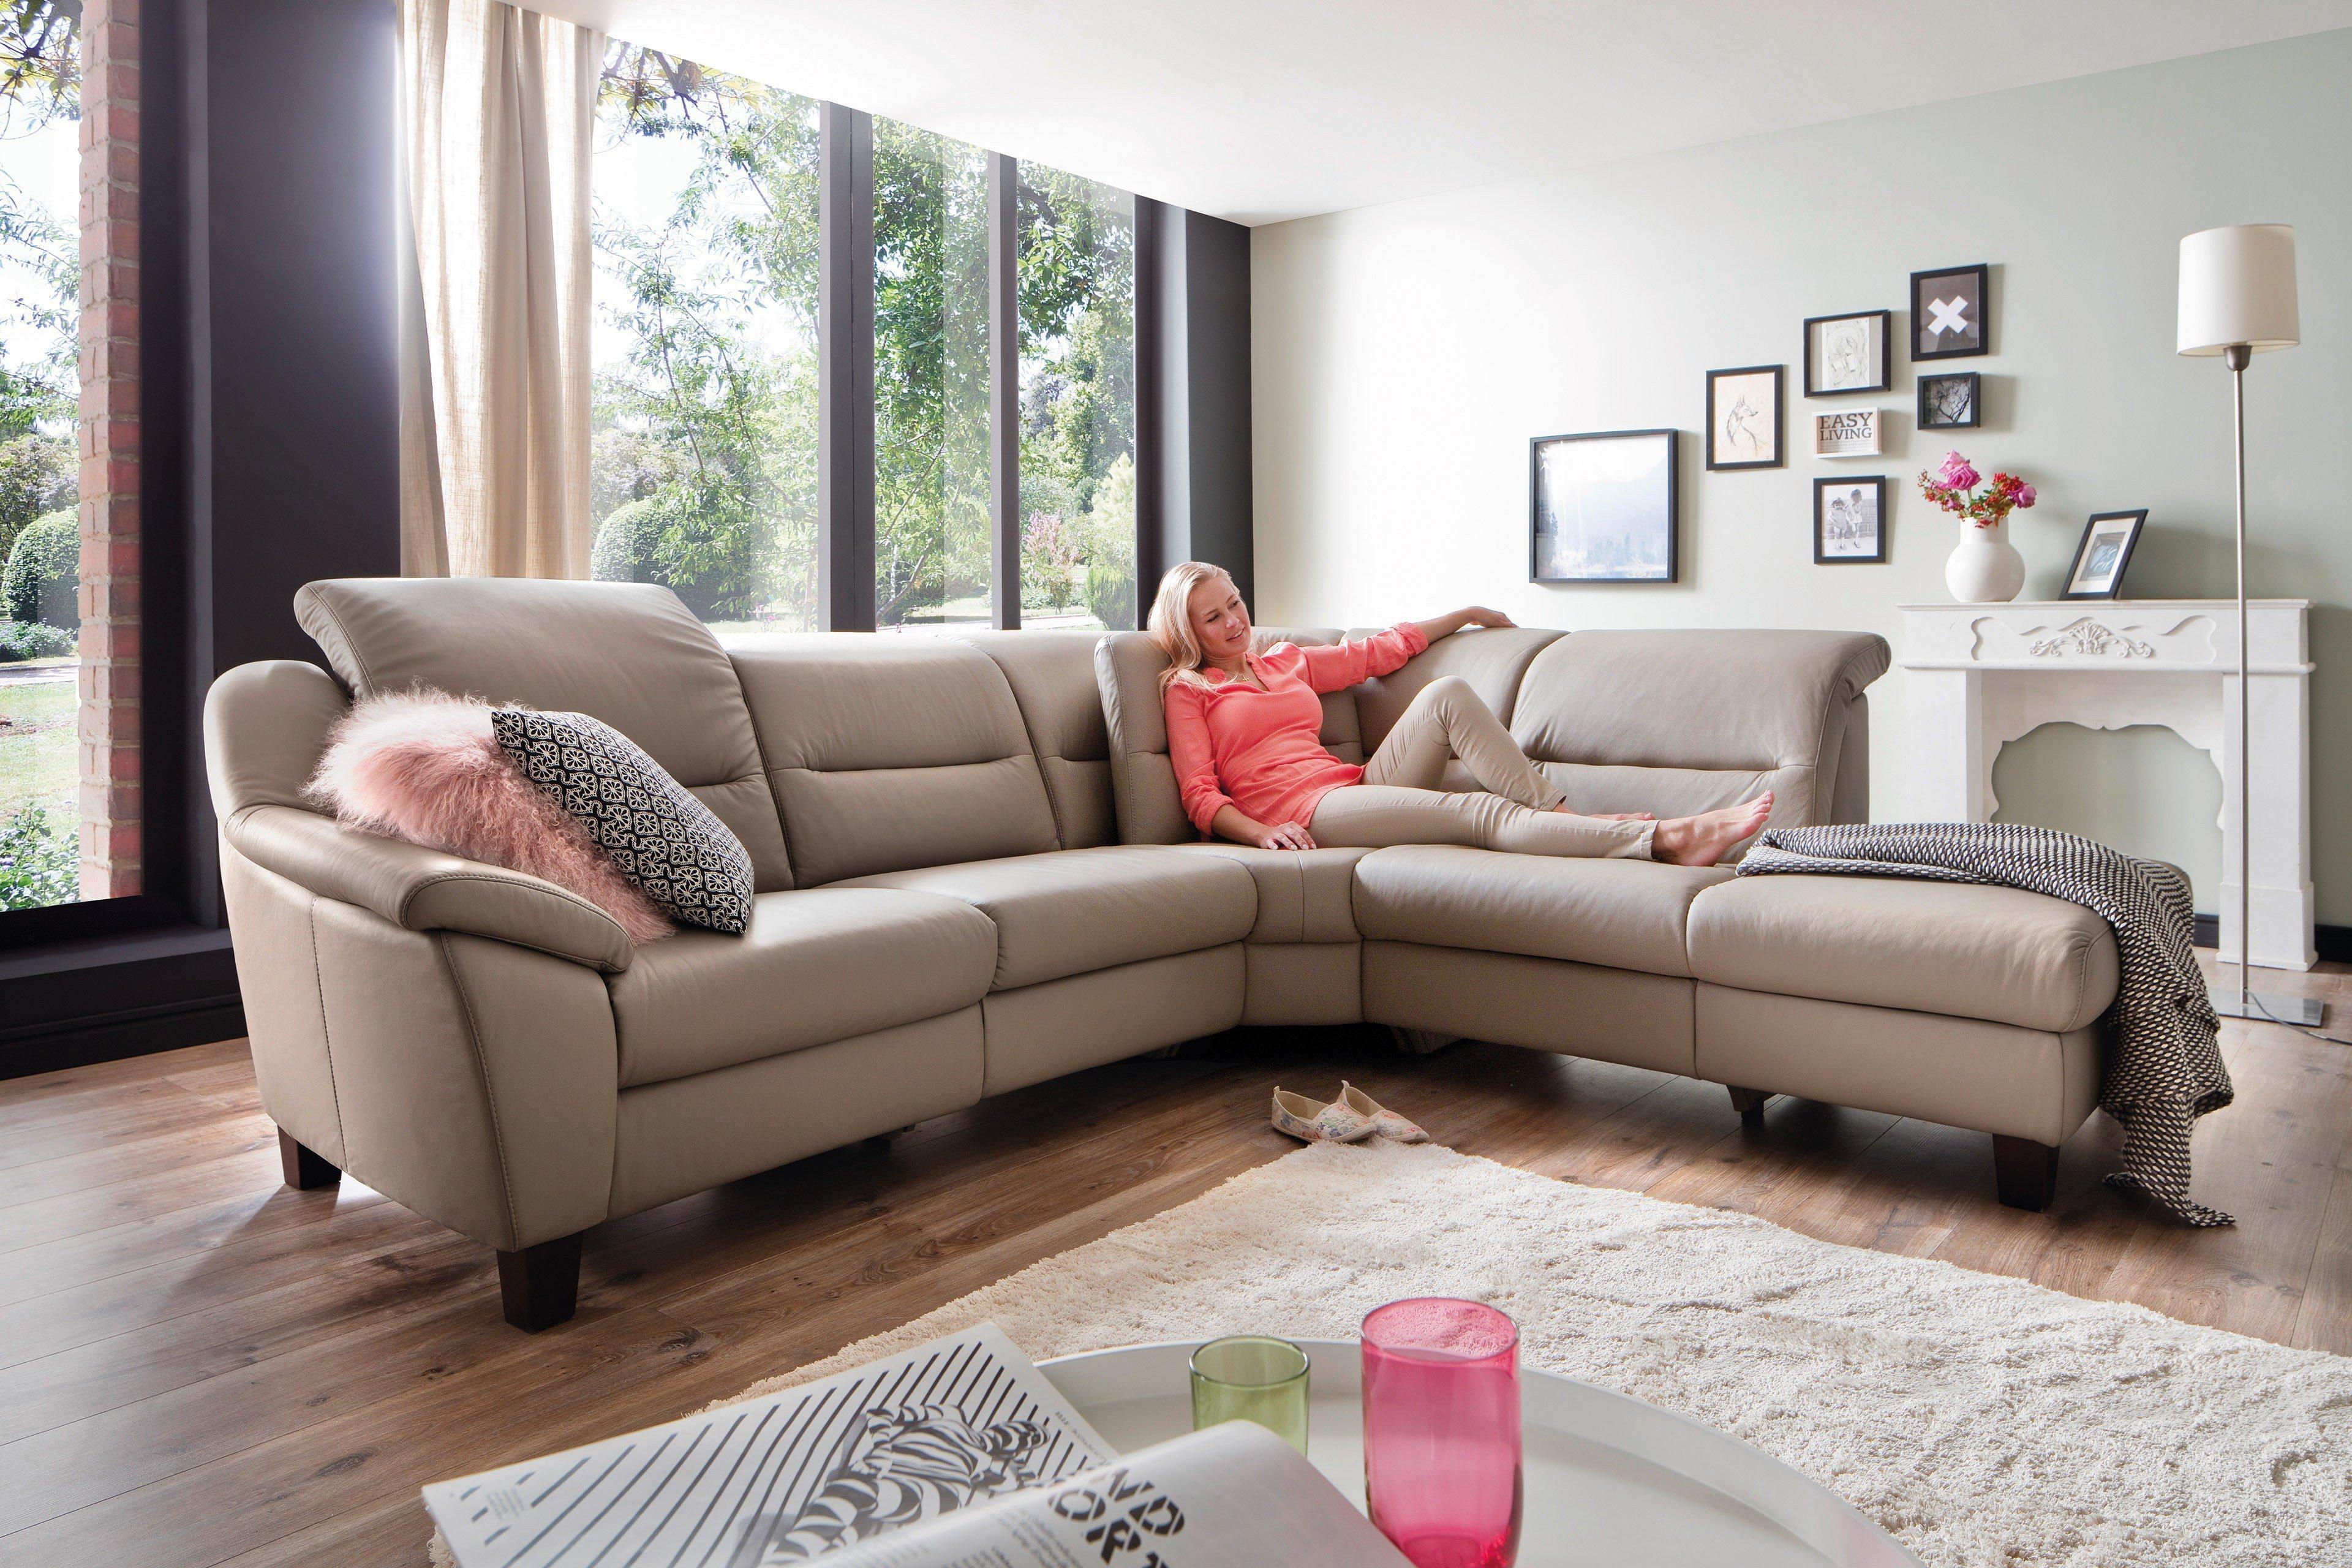 Großartig Leder Sofa Garnitur Beste Wahl Doreen Von Polsteria - Fort Ledersofa Plaza